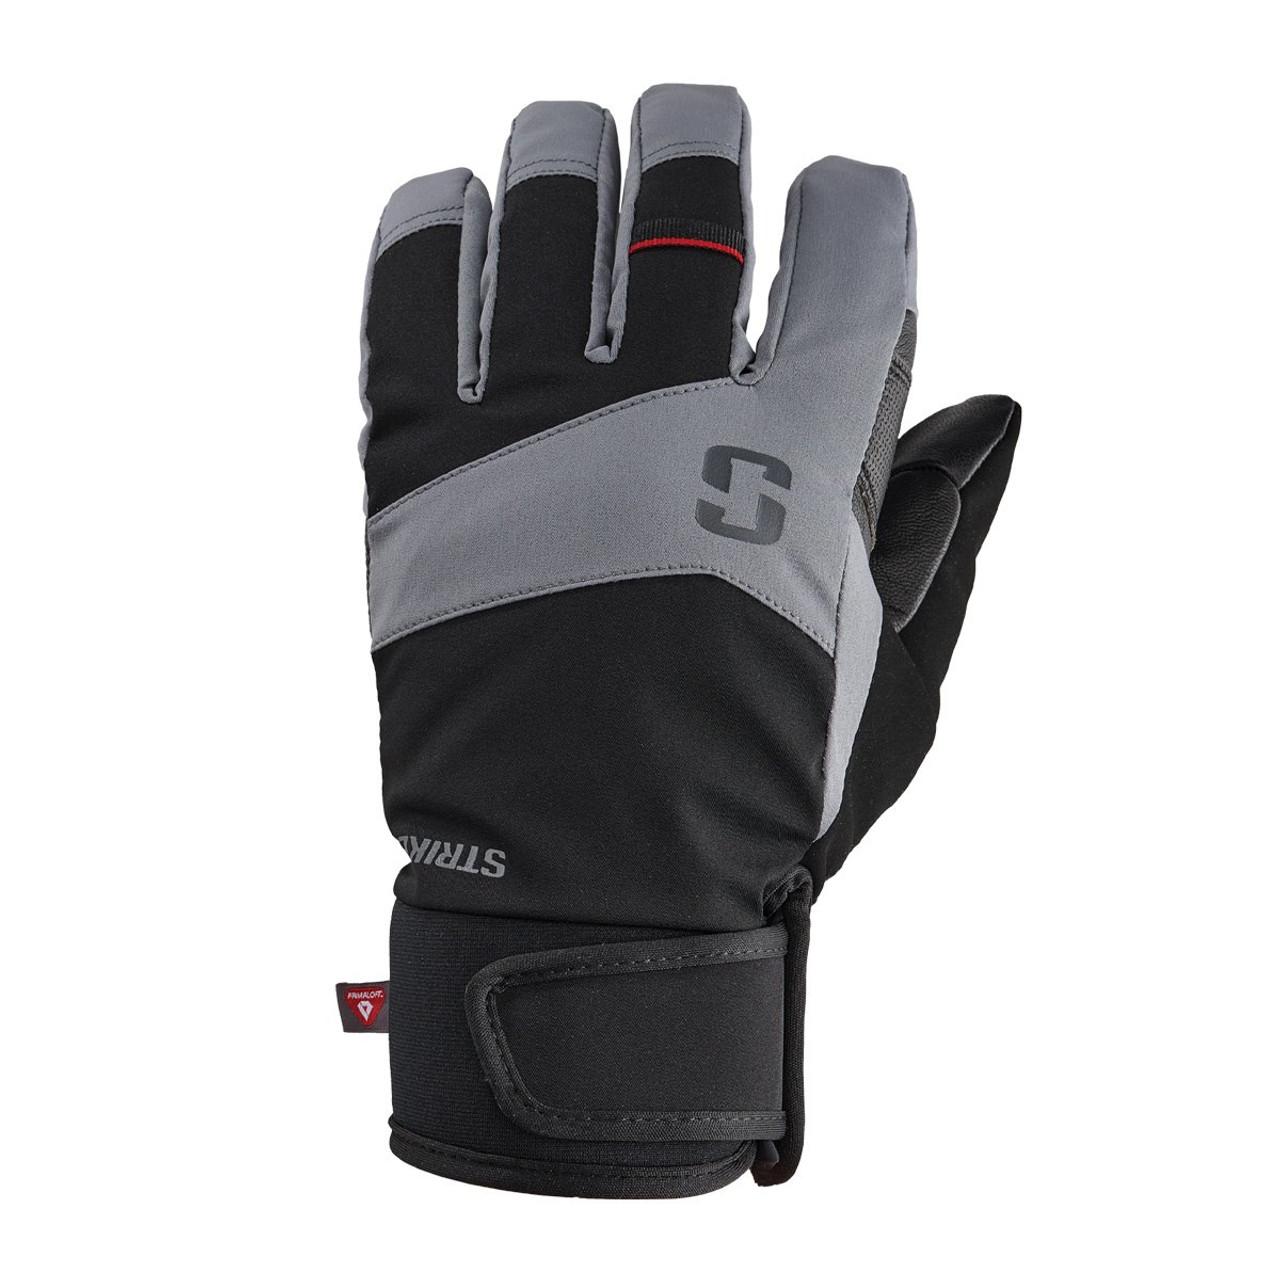 Striker Ice Apex Ice Fishing Gloves